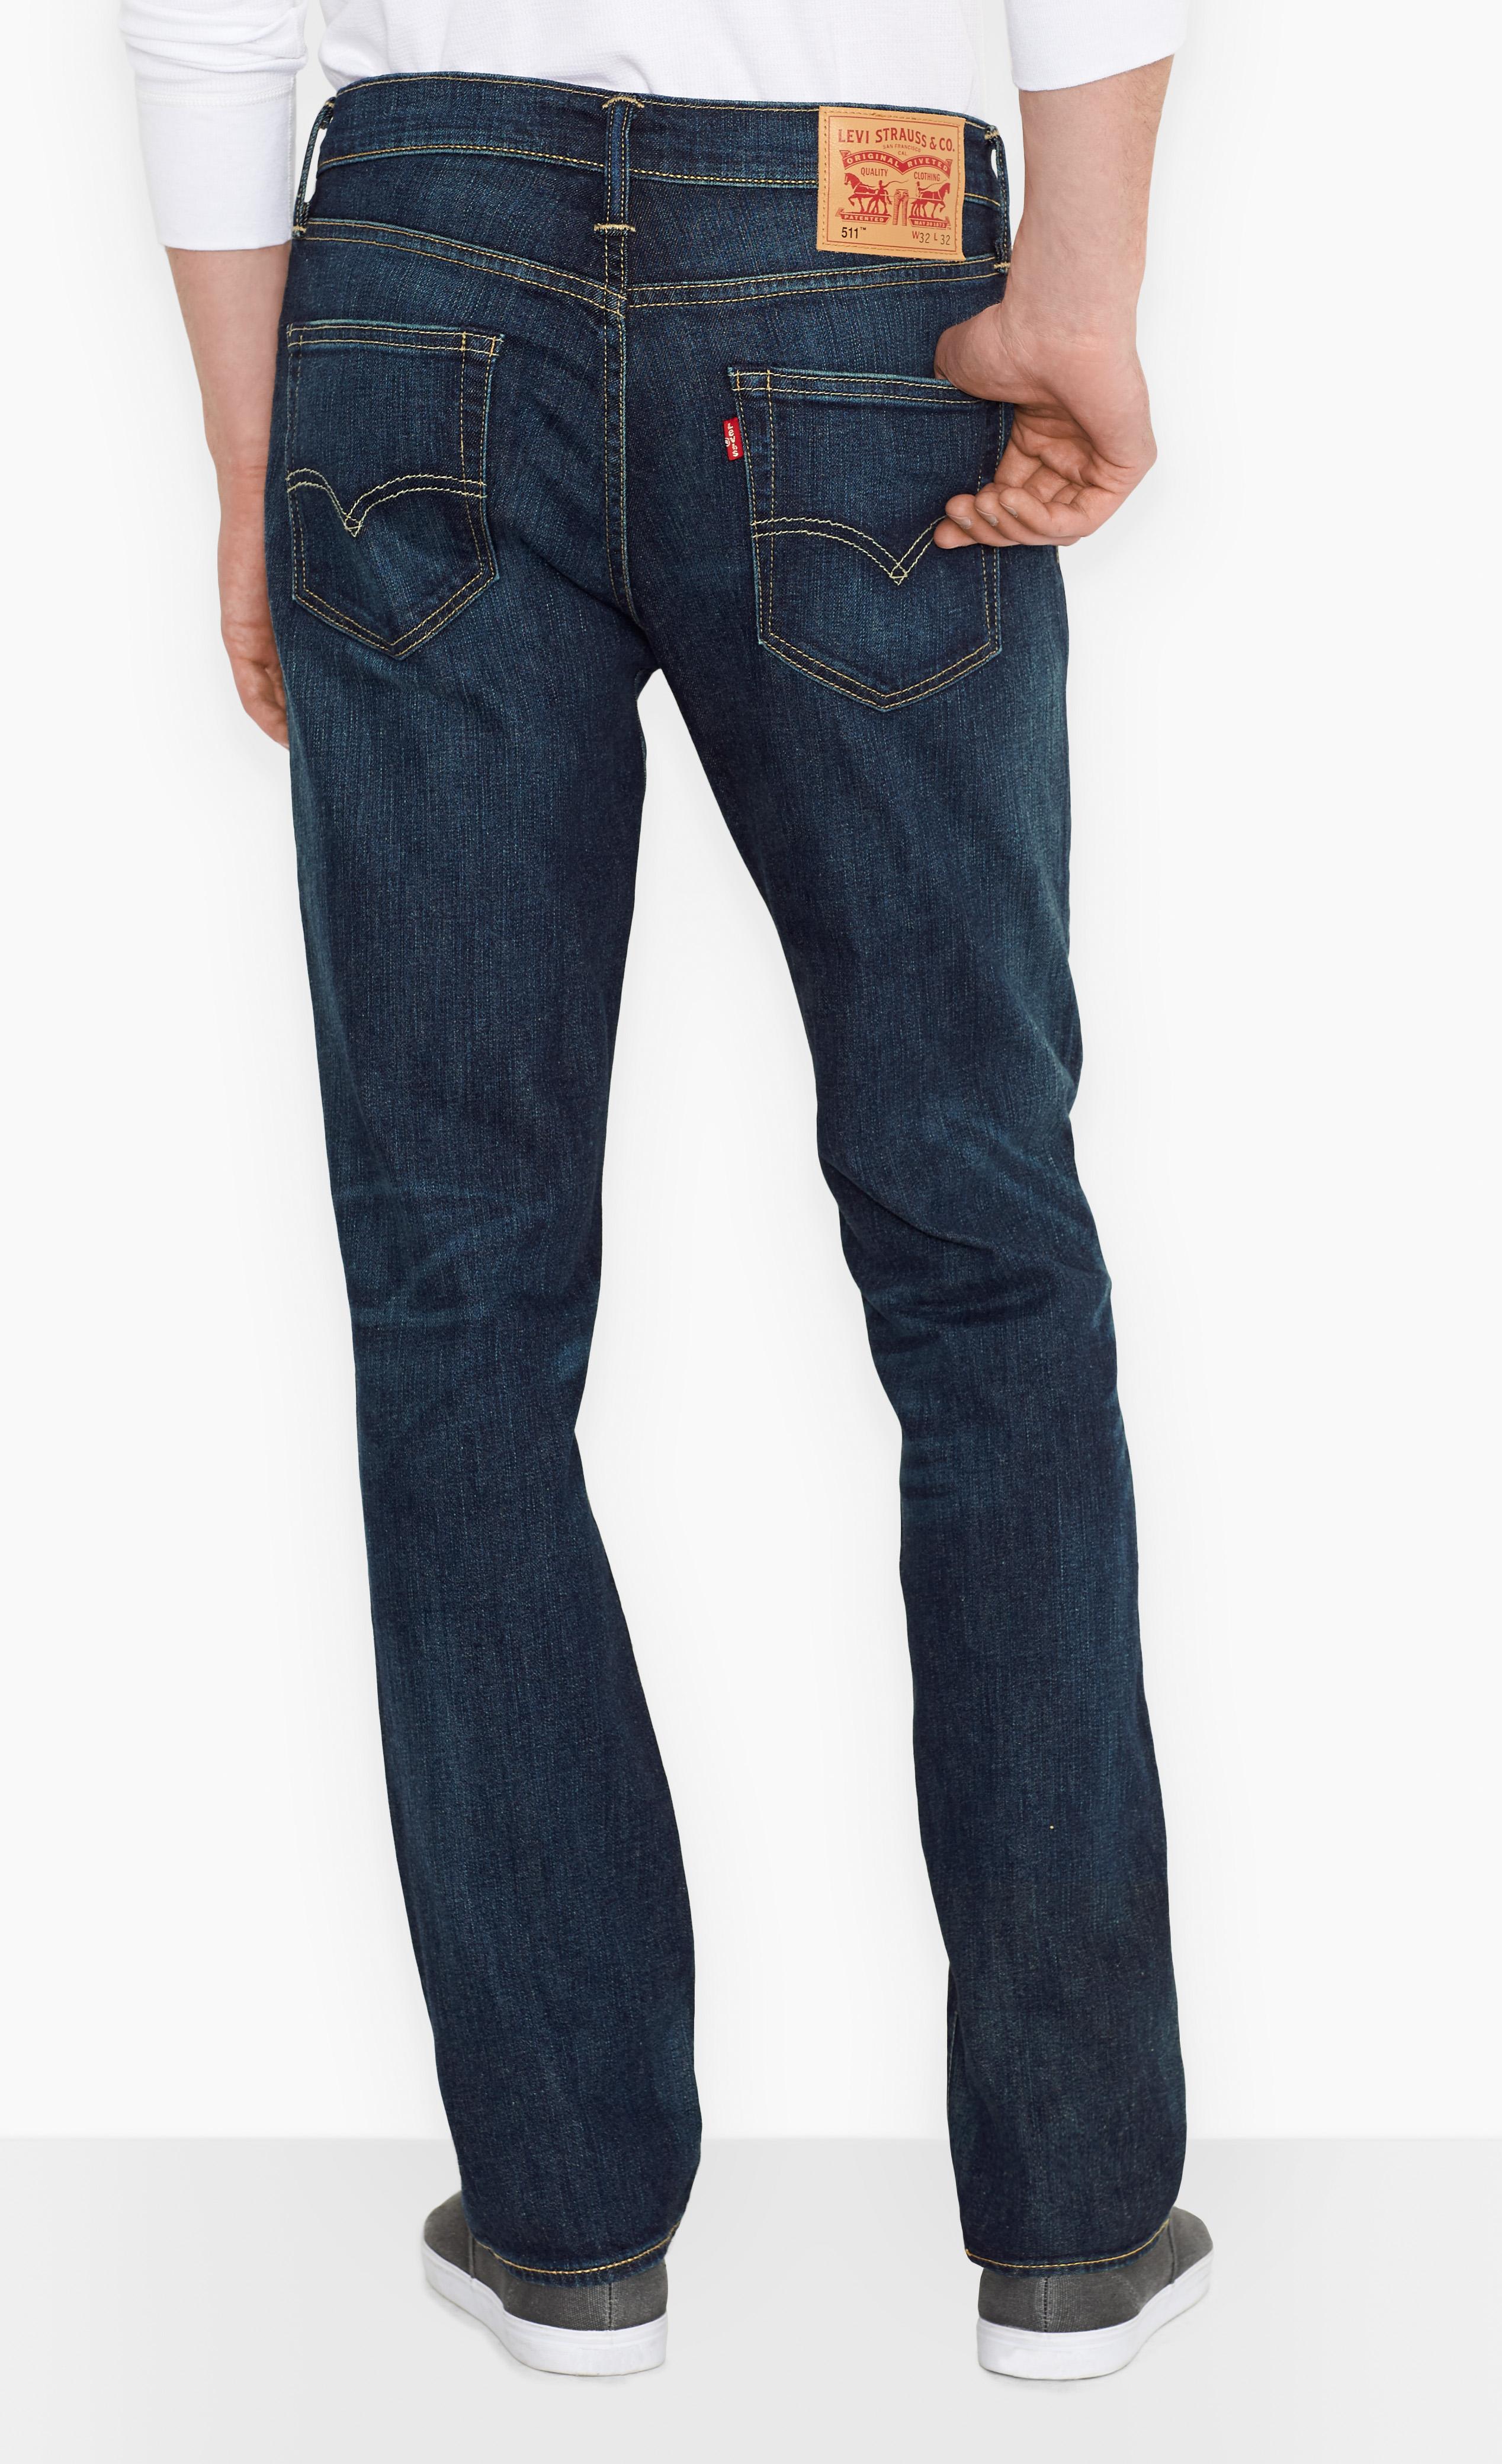 LEVIS Jeanshose Jeans 04511-0709 511 SLIM FIT RAINSHOWER W18-LJJ1